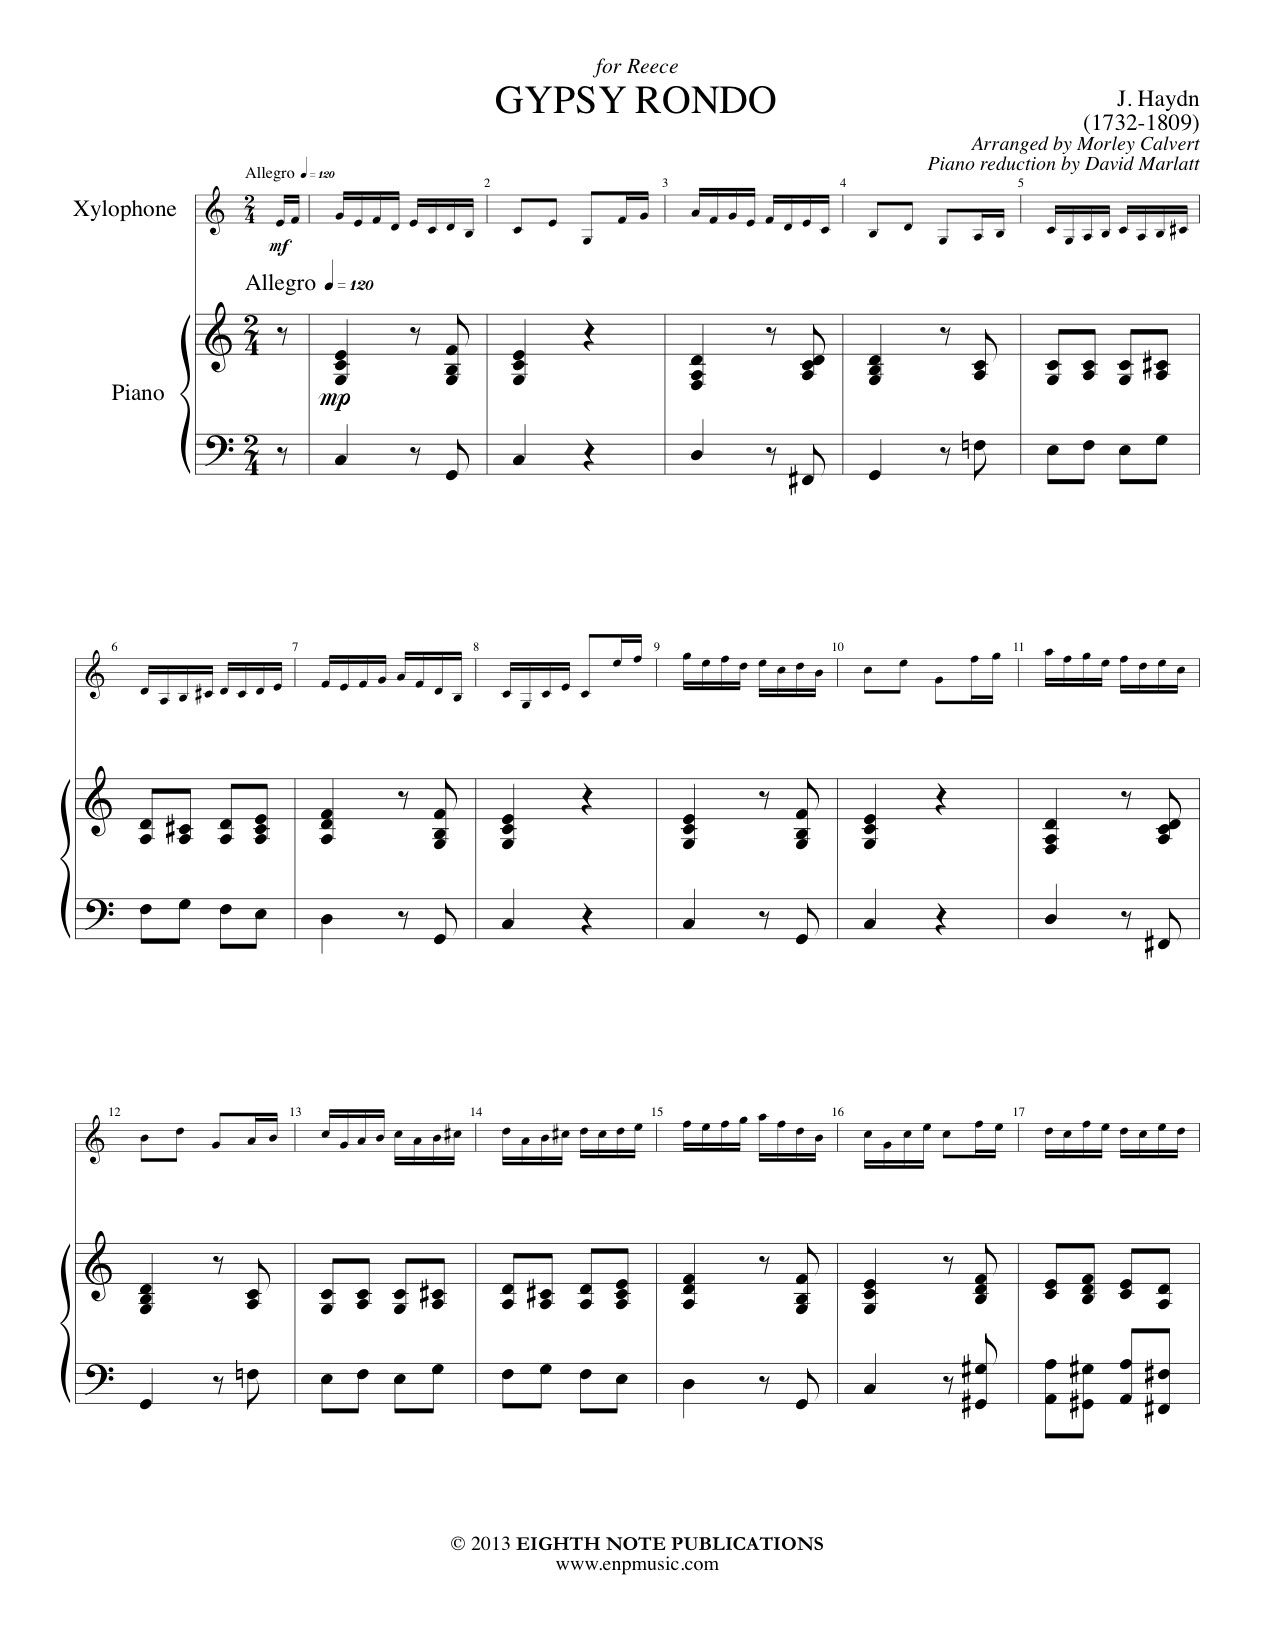 Gypsy Rondo - Xylophone Solo - Franz Joseph Haydn